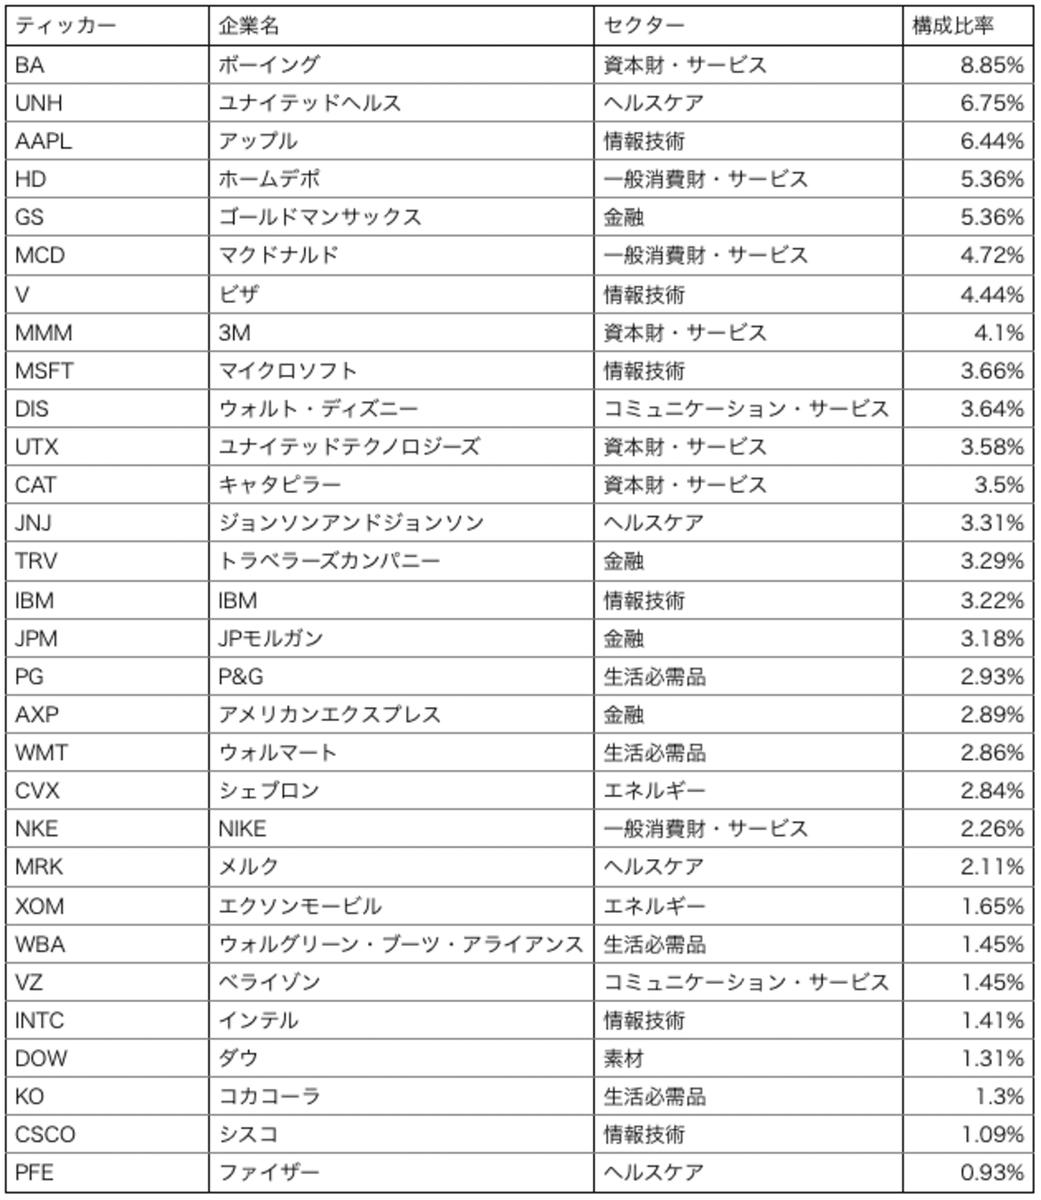 NYダウ連動ETF「DIA」のティッカー・構成銘柄・セクター・構成比率